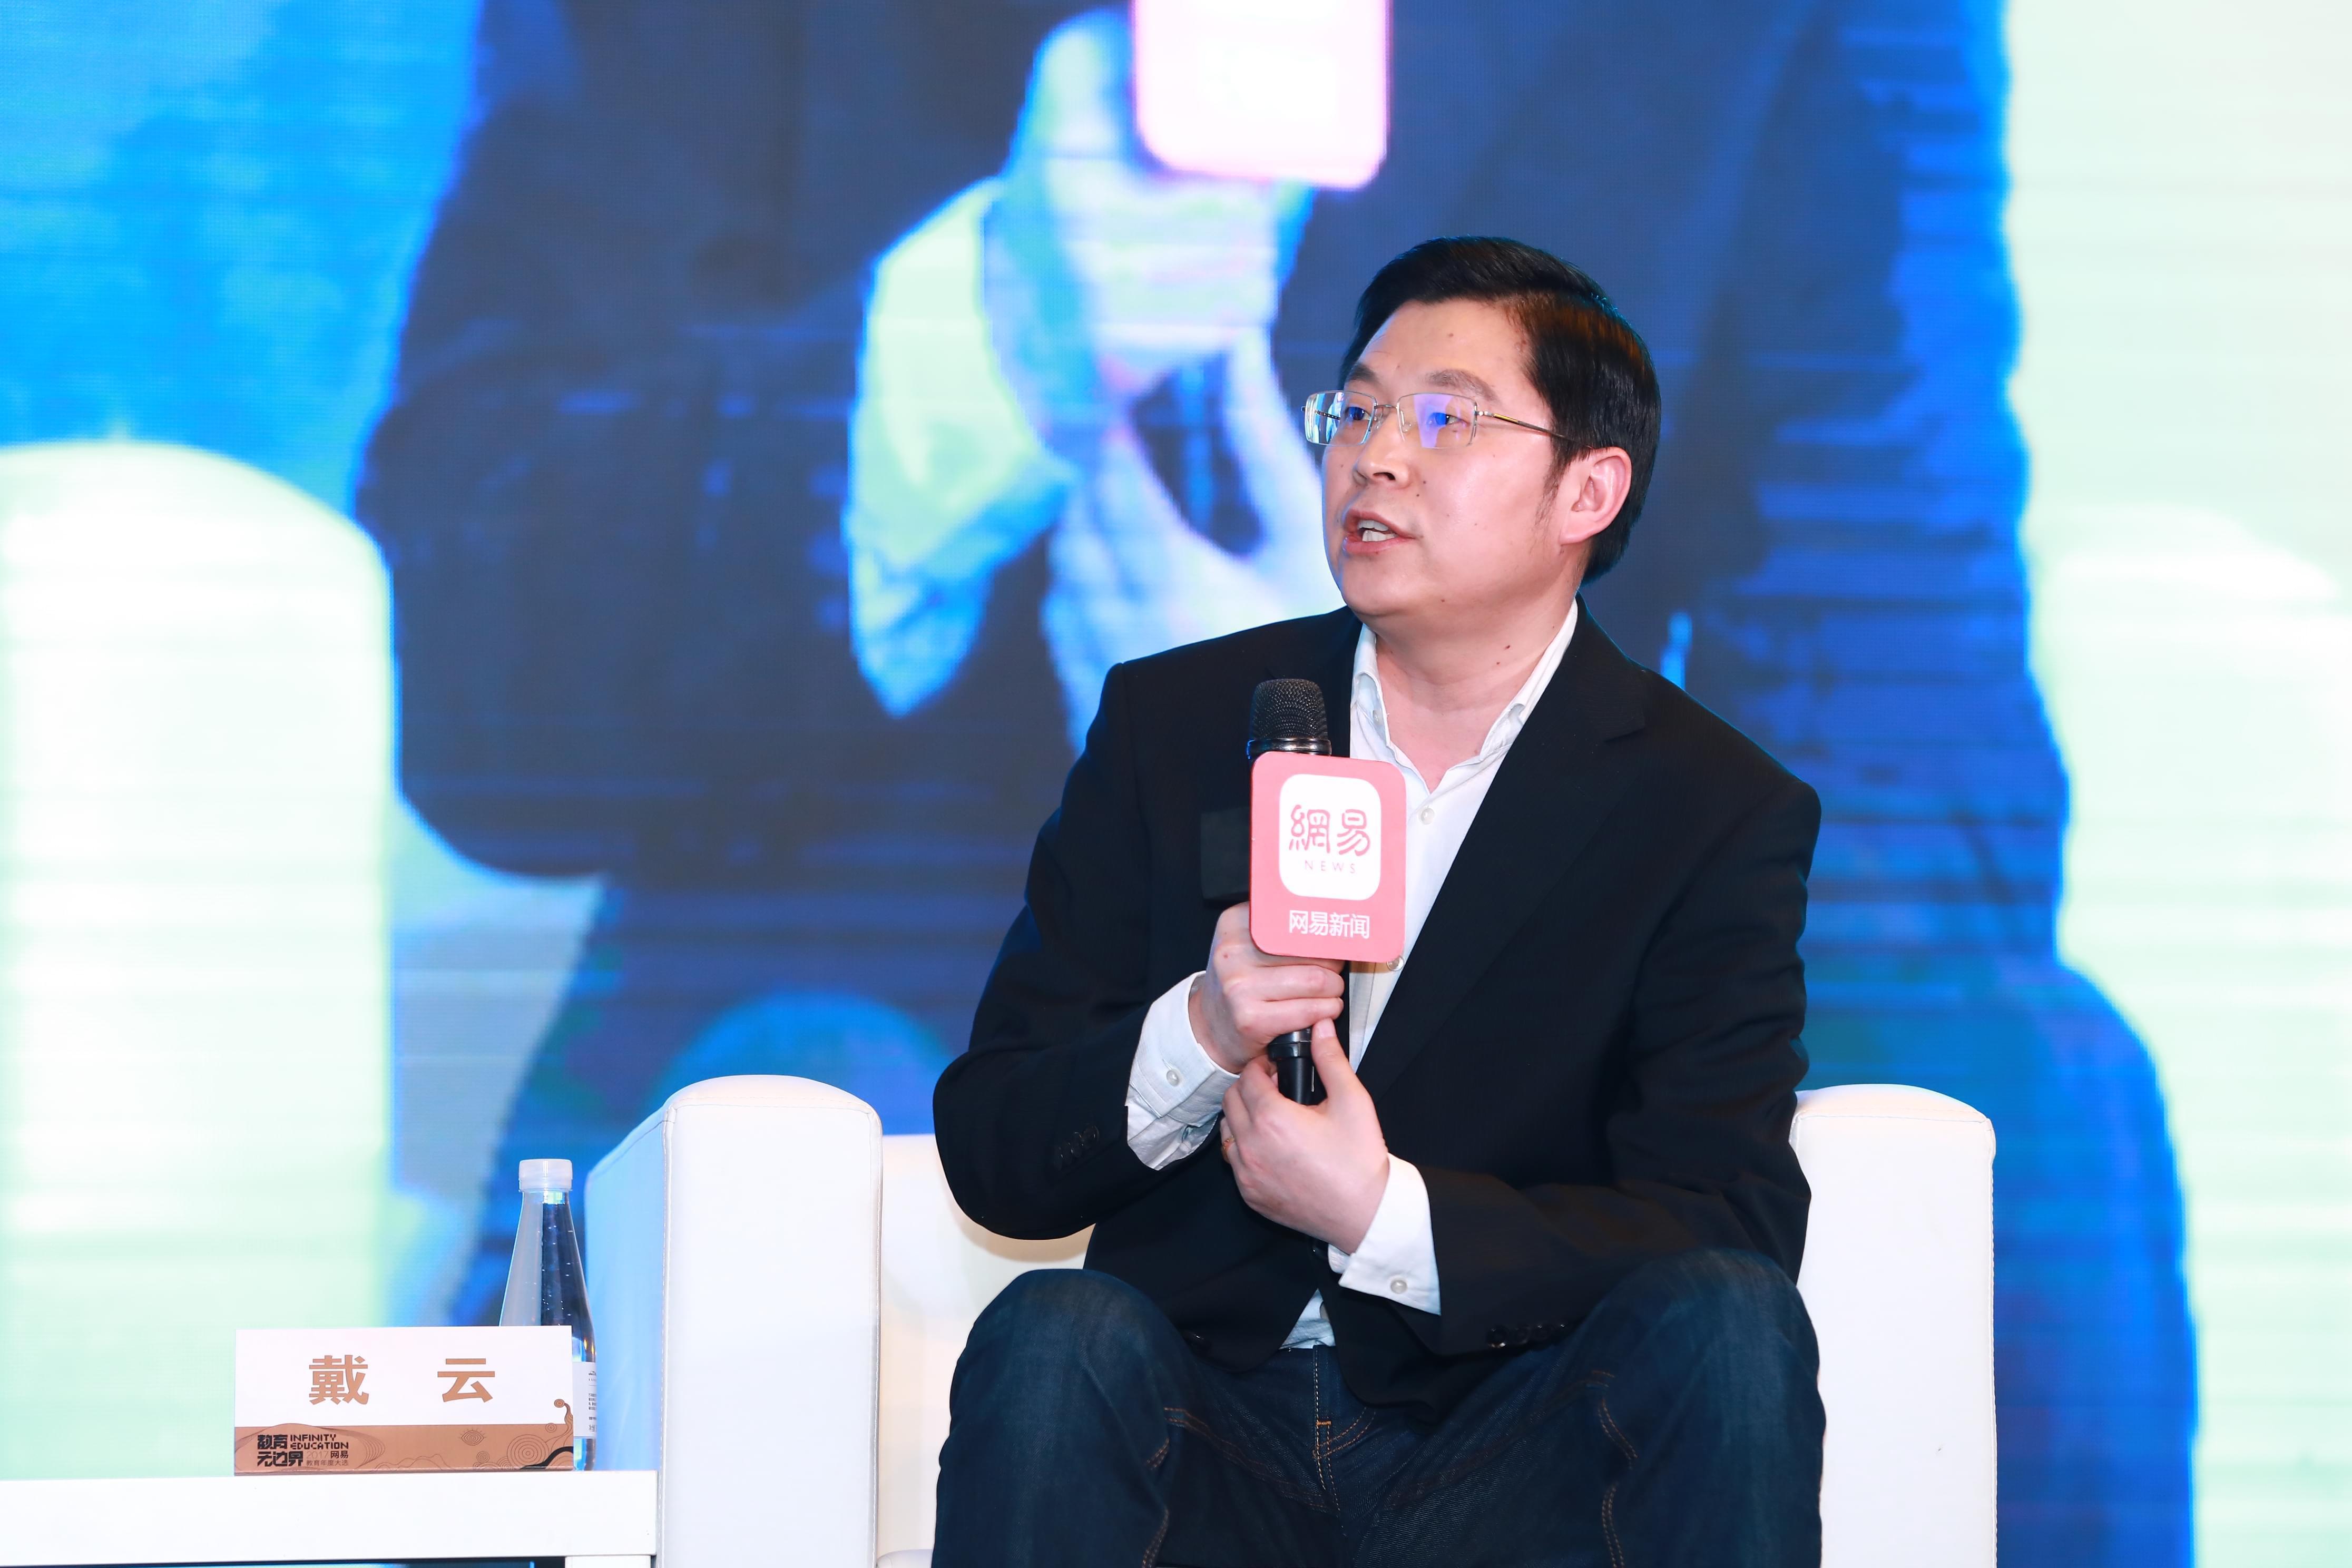 51Talk课程产品副总裁 戴云先生